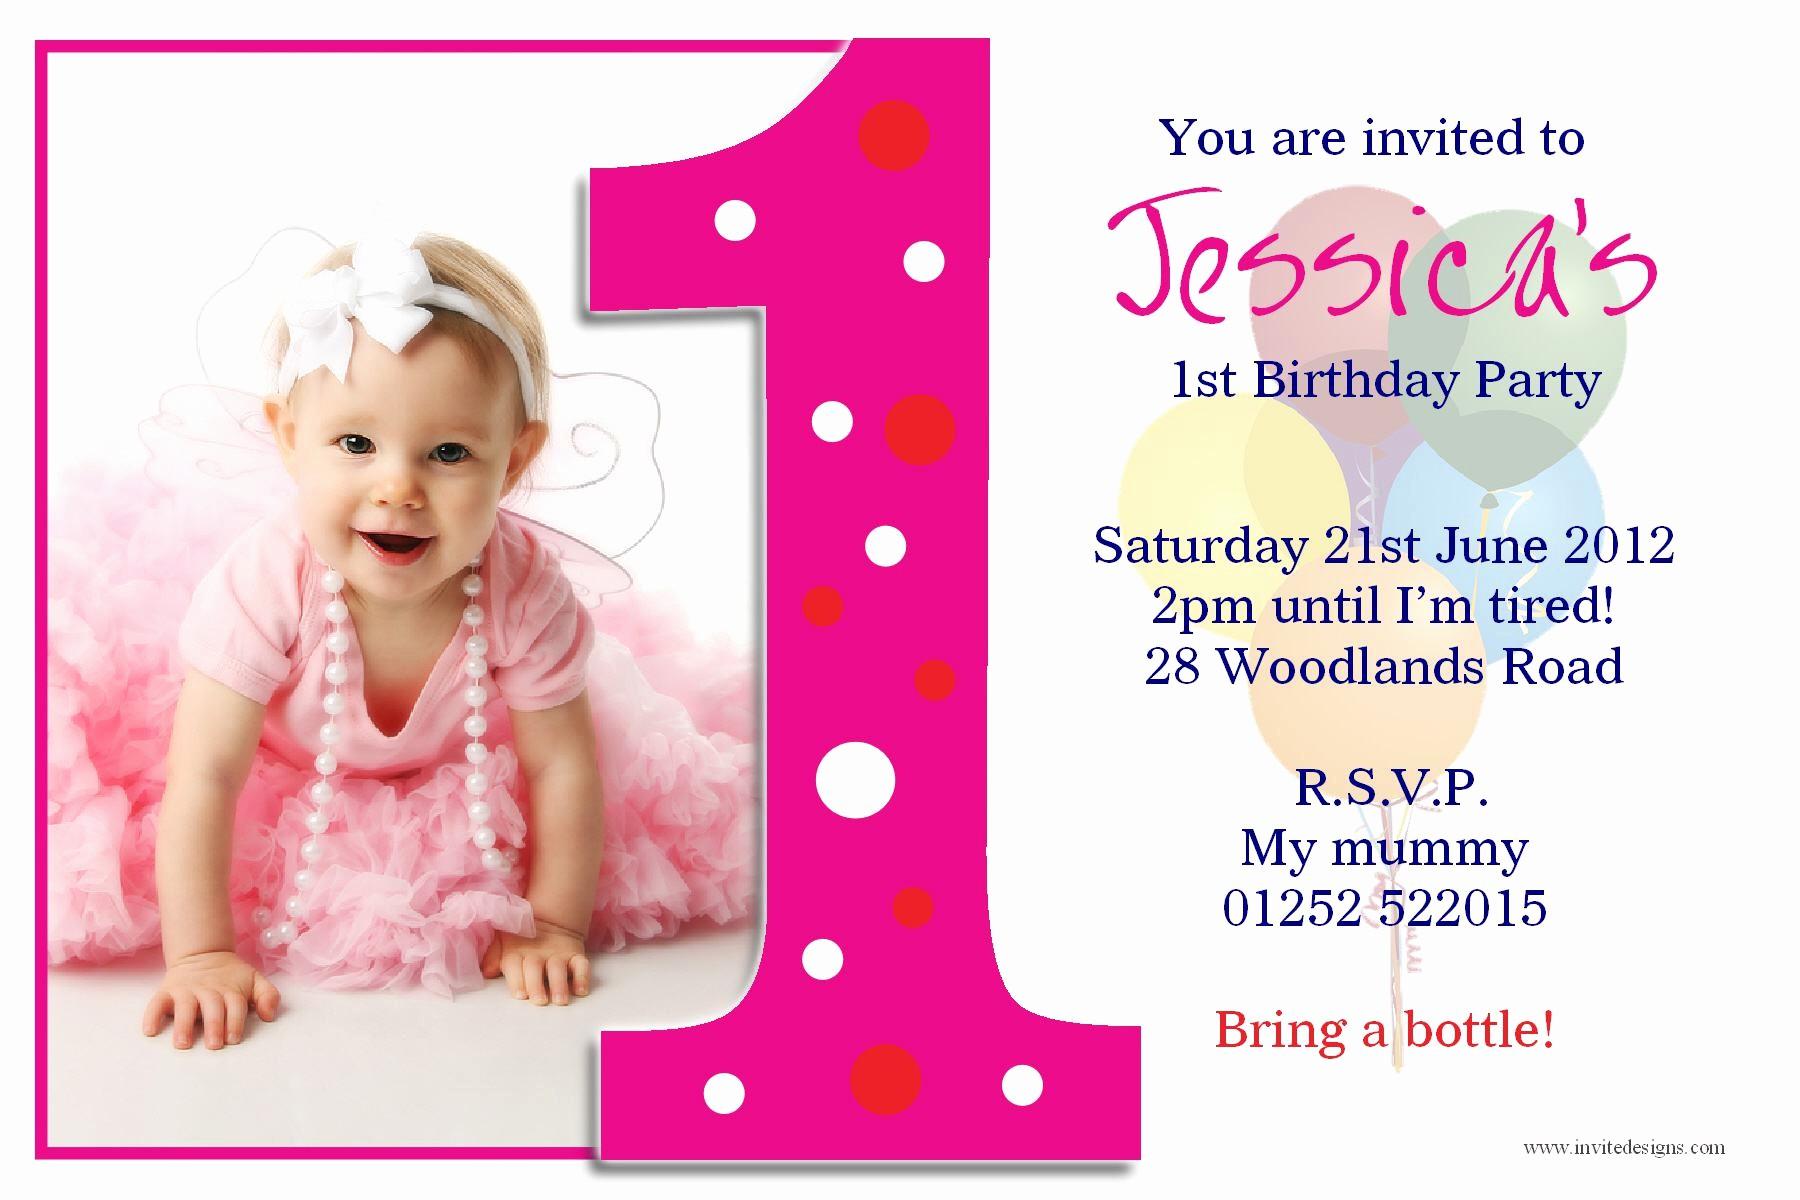 Birthday Invitation Card Template Free Best Of Birthday Invitation Card Birthday Invitation Card